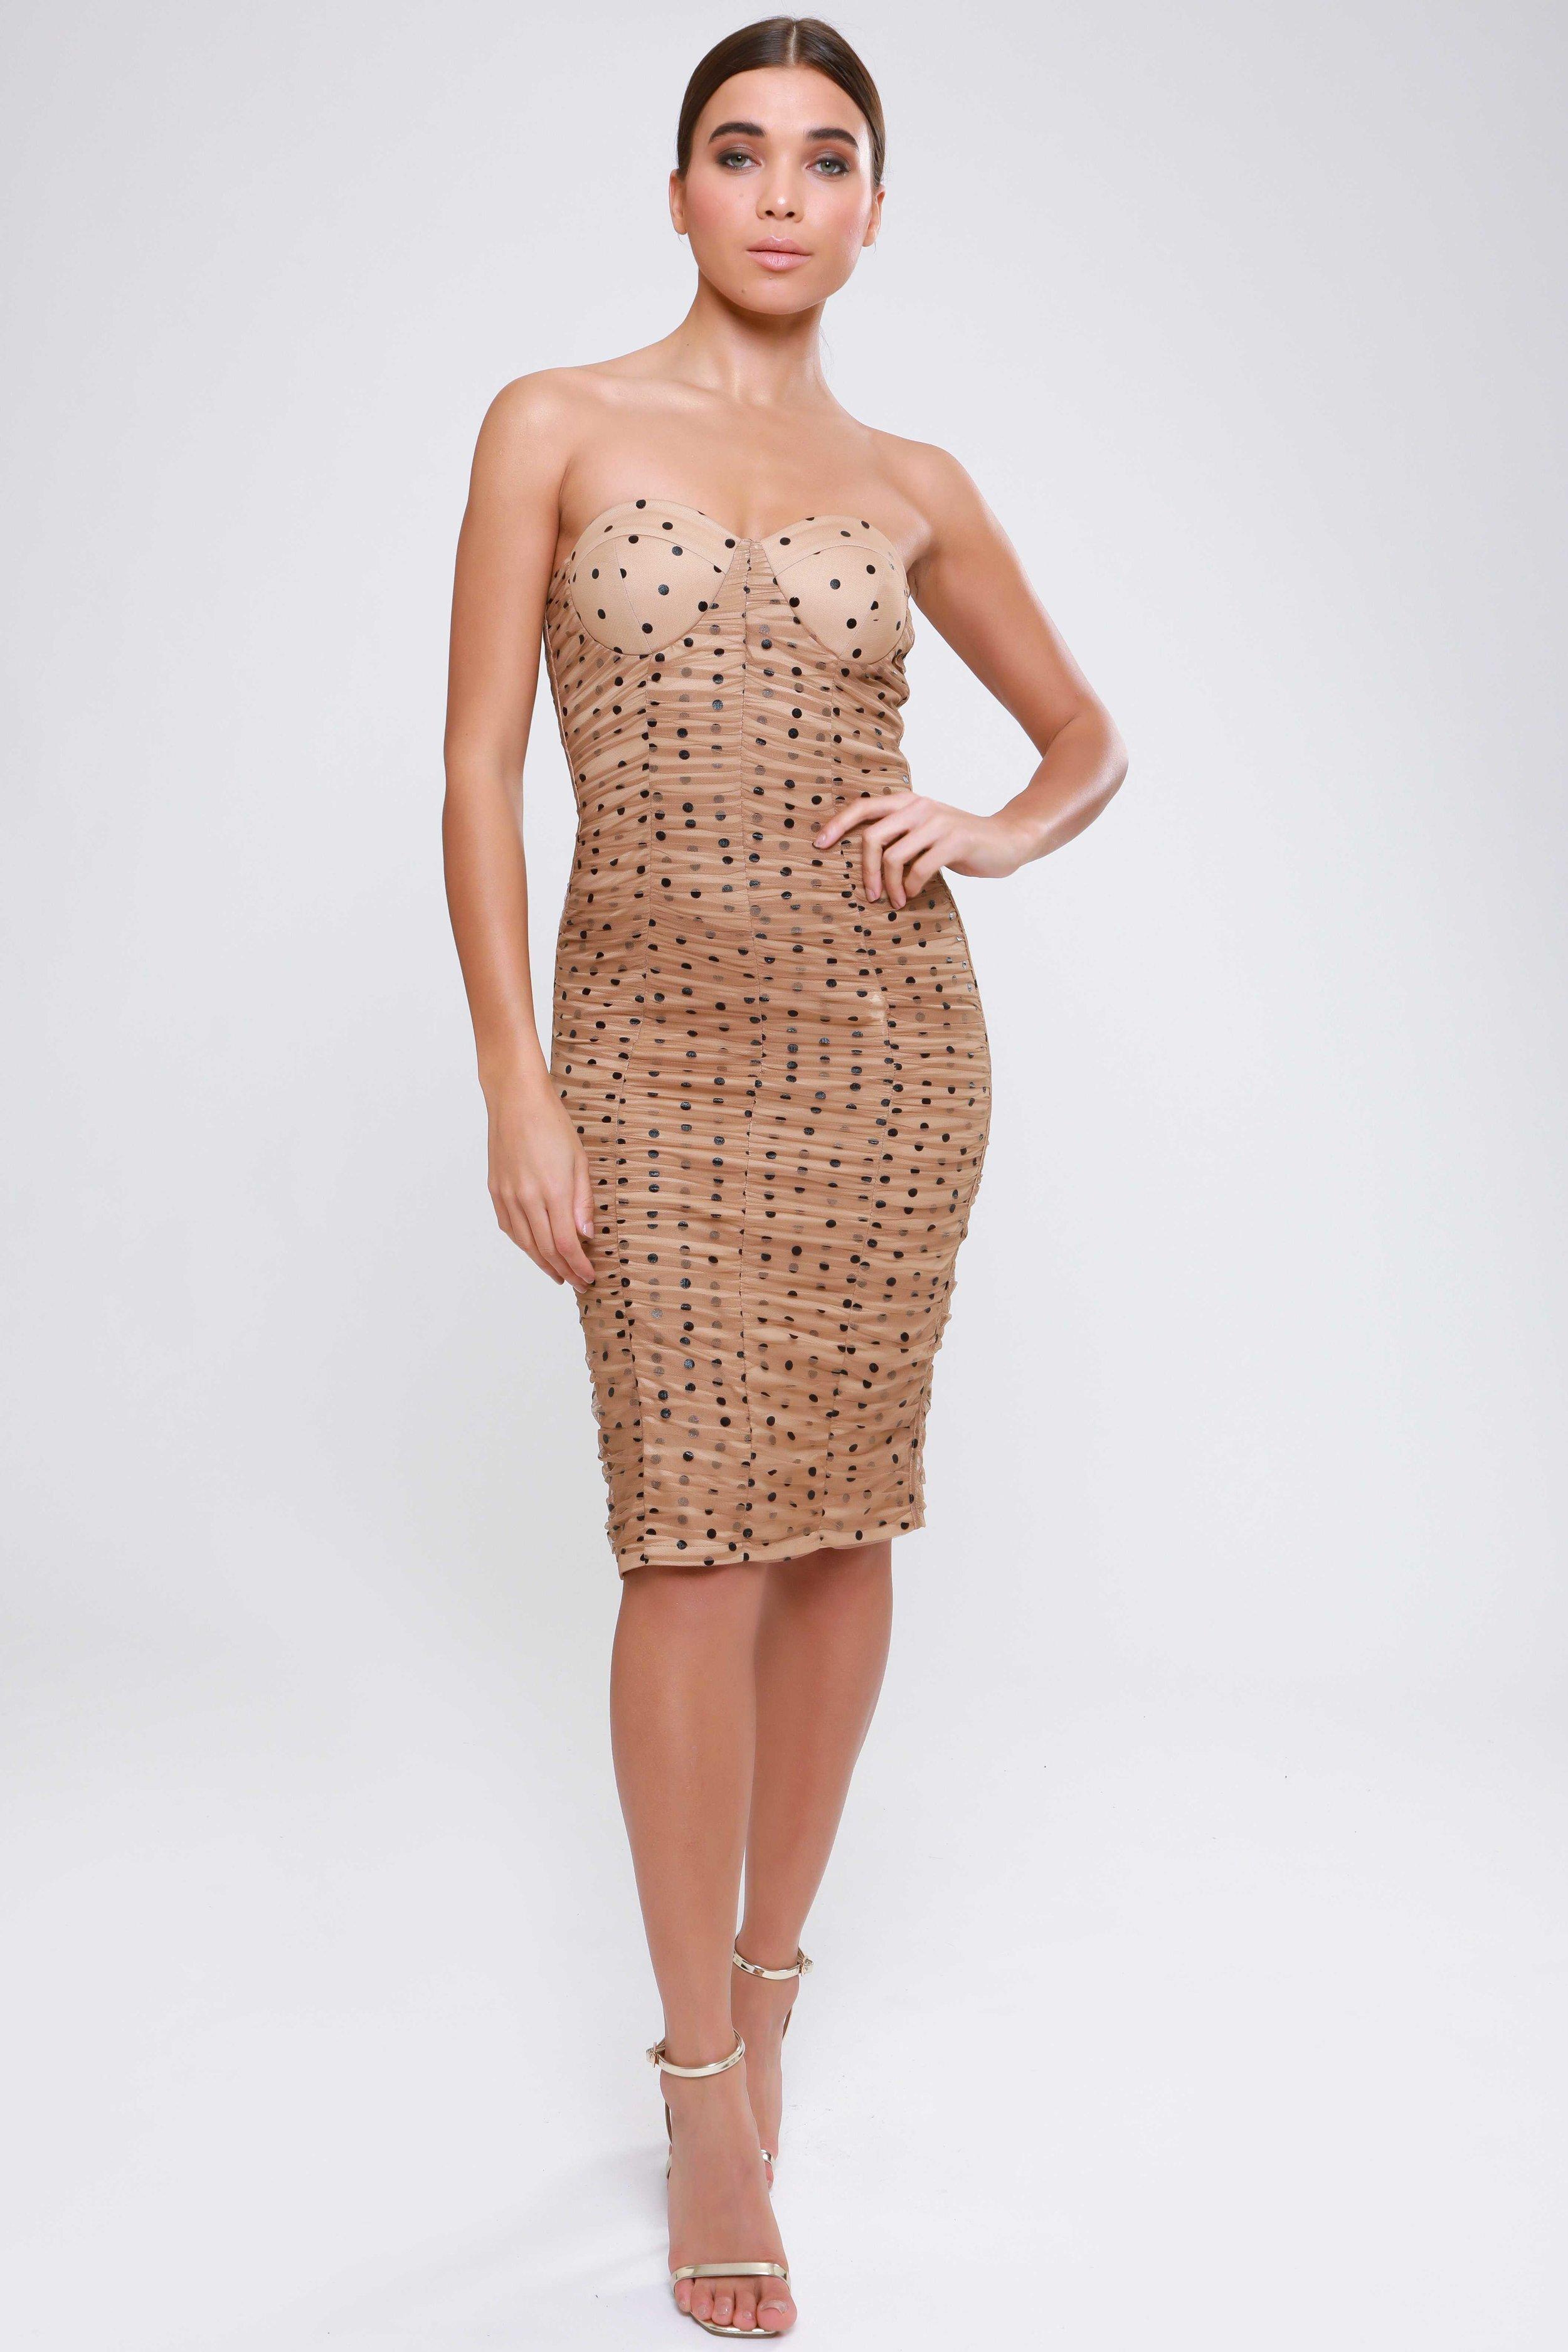 Polka Dot Mesh Rouching  Detail Midi Dress   £49.00